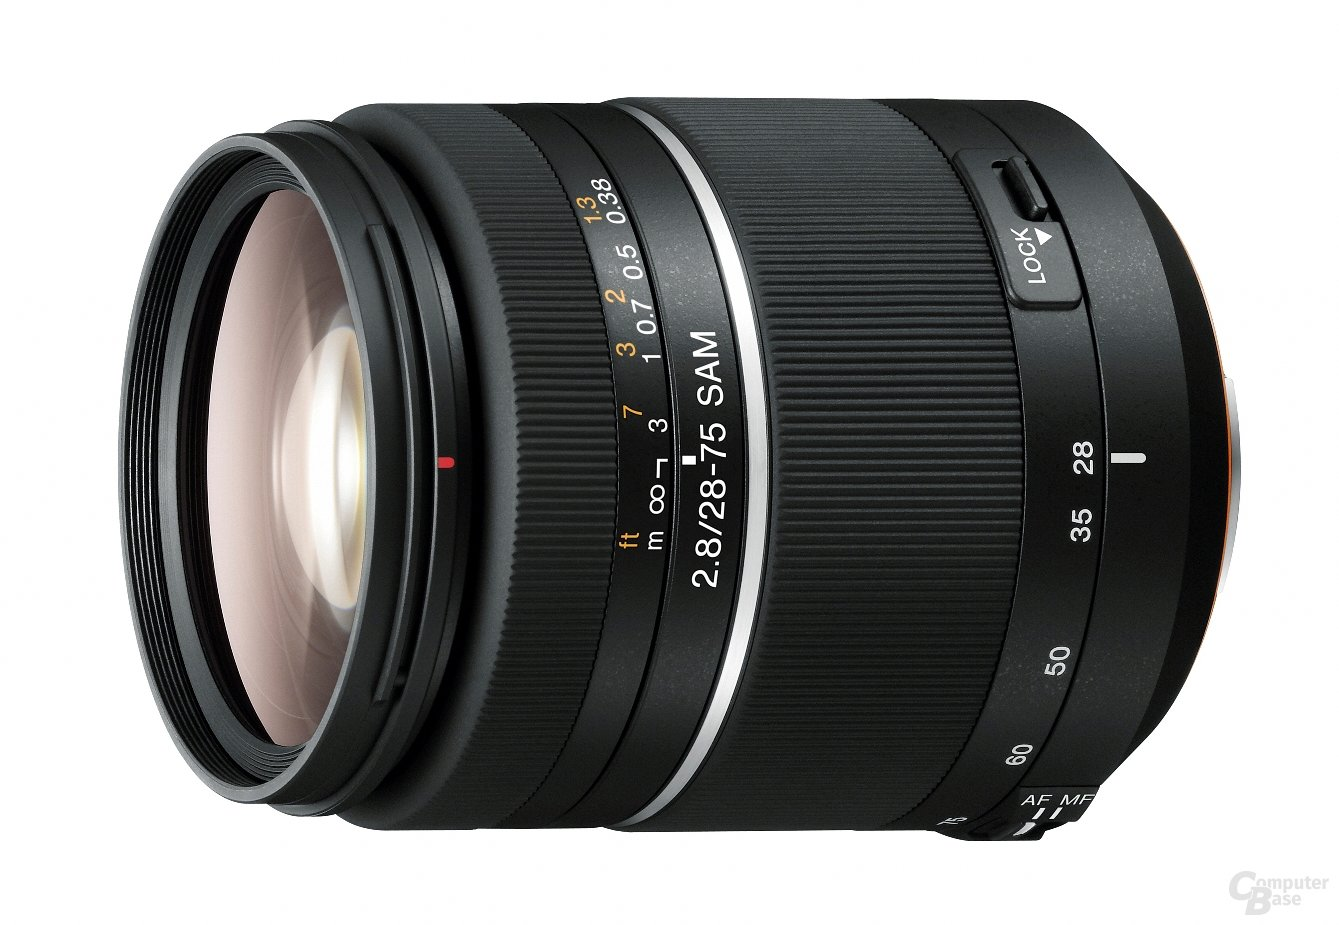 Sony 28-75 mm F2.8 SAM